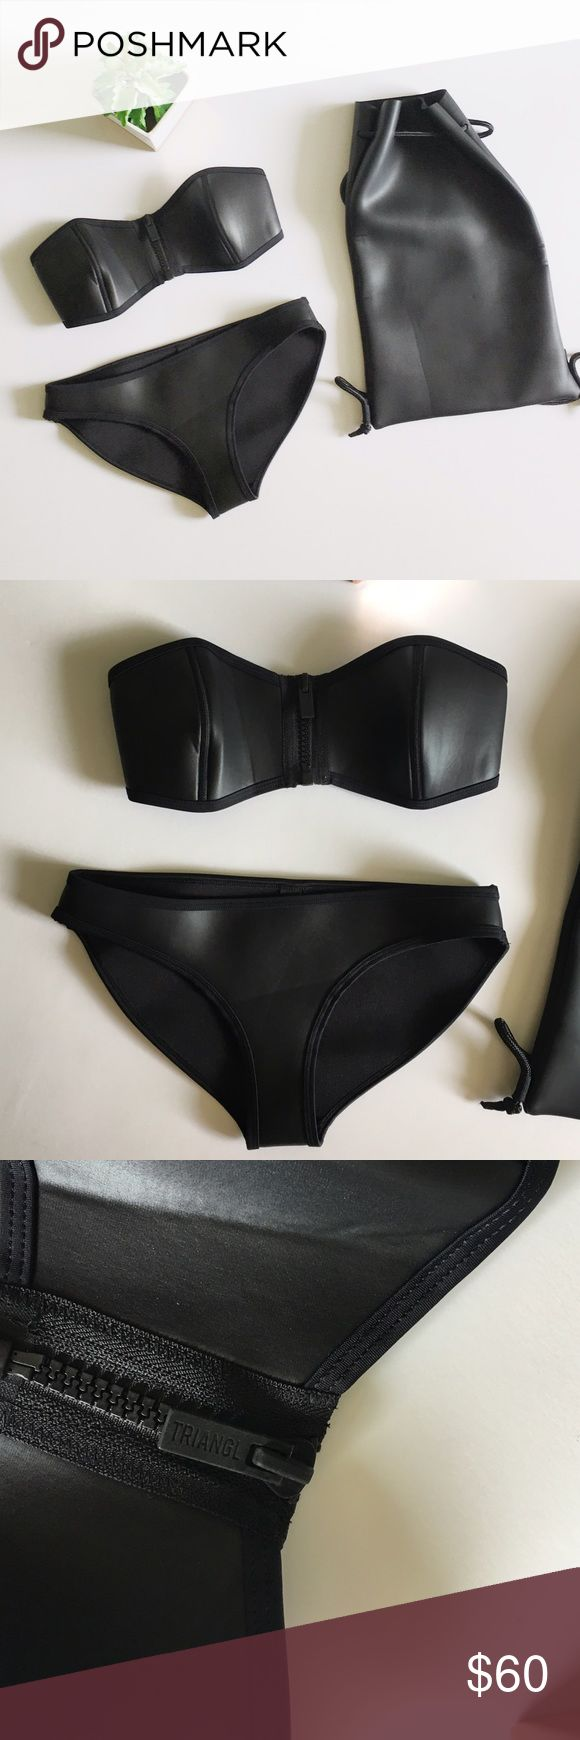 Triangl Bikini Black Bandeau Set with Bag Triangl black bikini set size small. Bandeau style. No stains or holes, smoke and pet free. Open to offers! Bag included. triangl swimwear Swim Bikinis